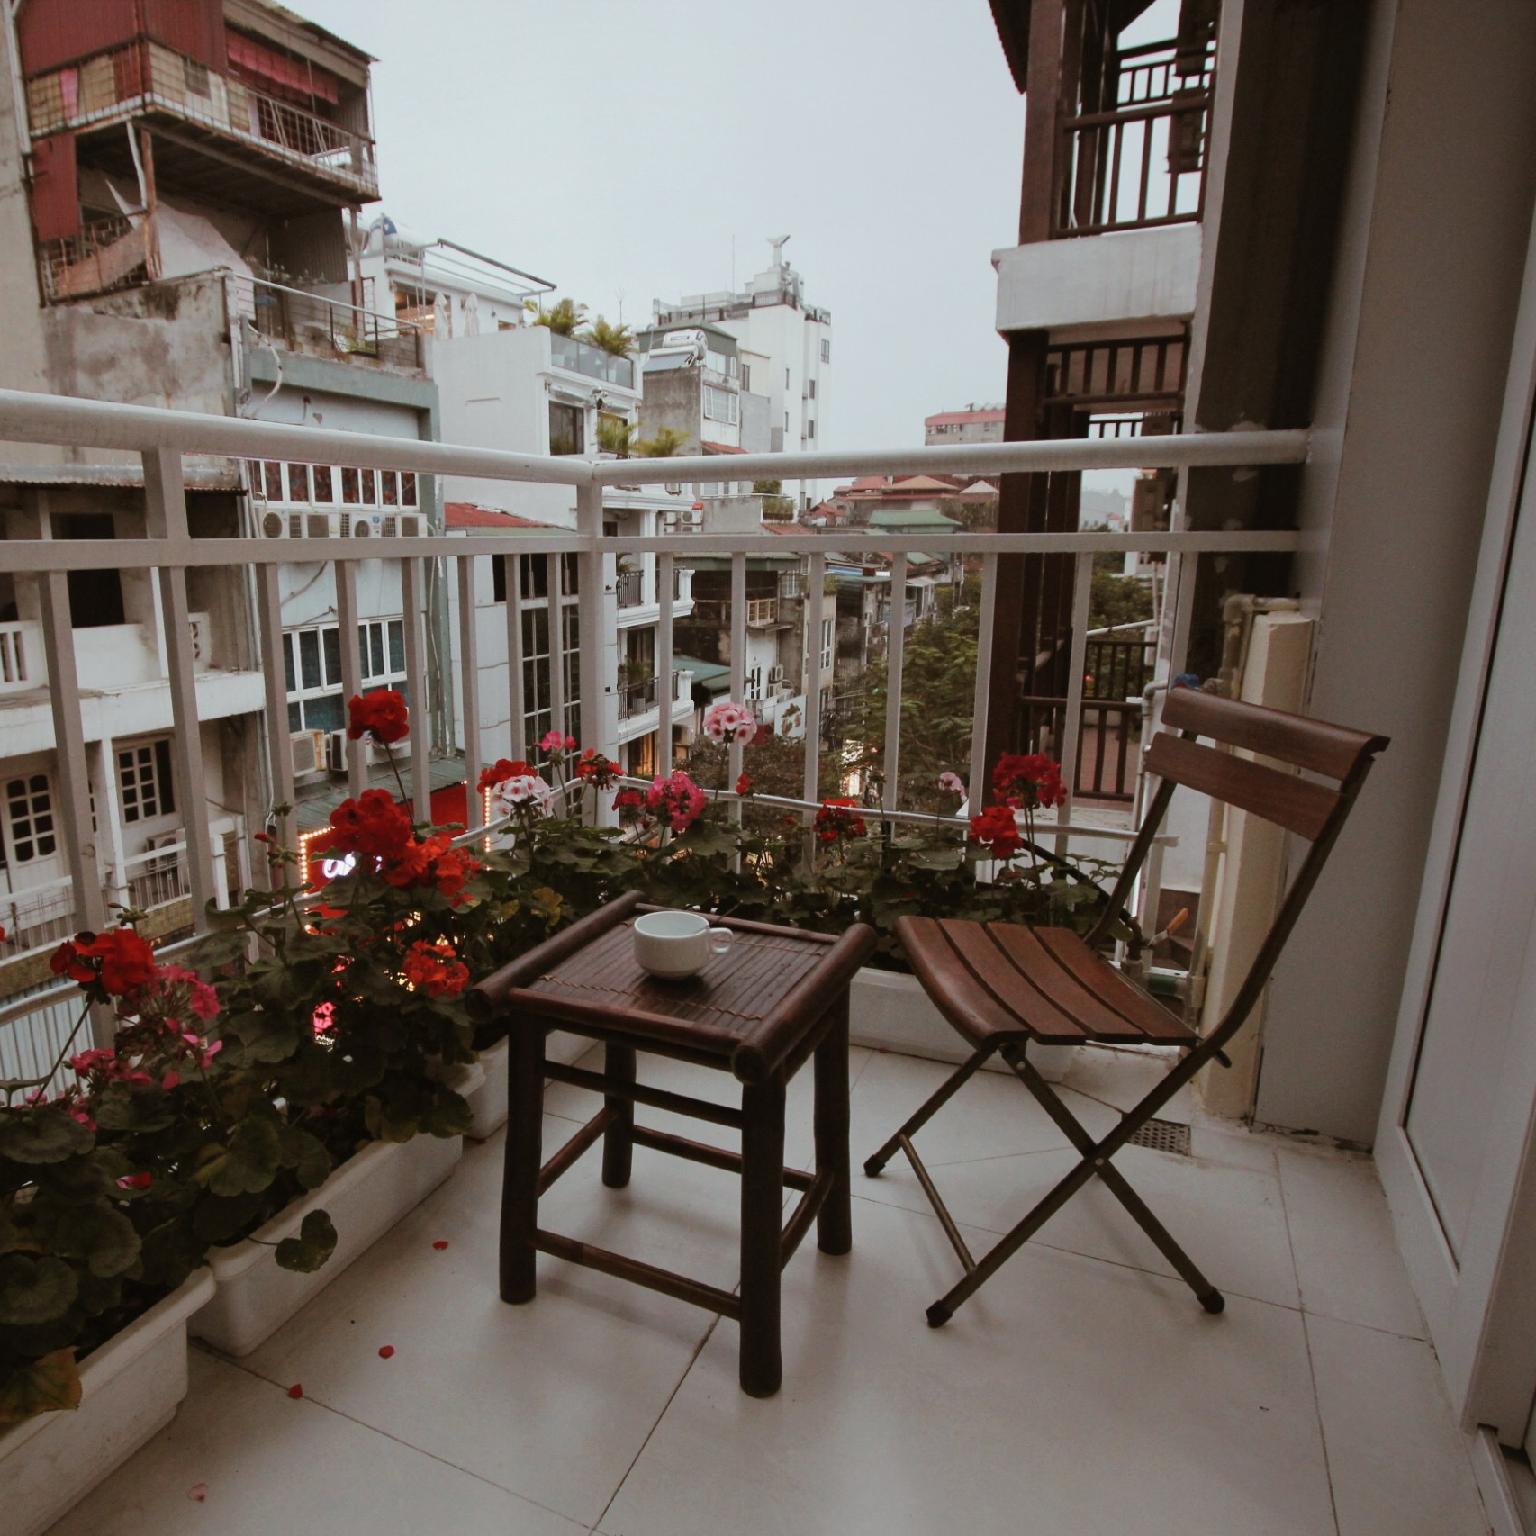 Underbar Balcony, 24/7 staff, central, bestprice tours Apartment (Hanoi FY-88